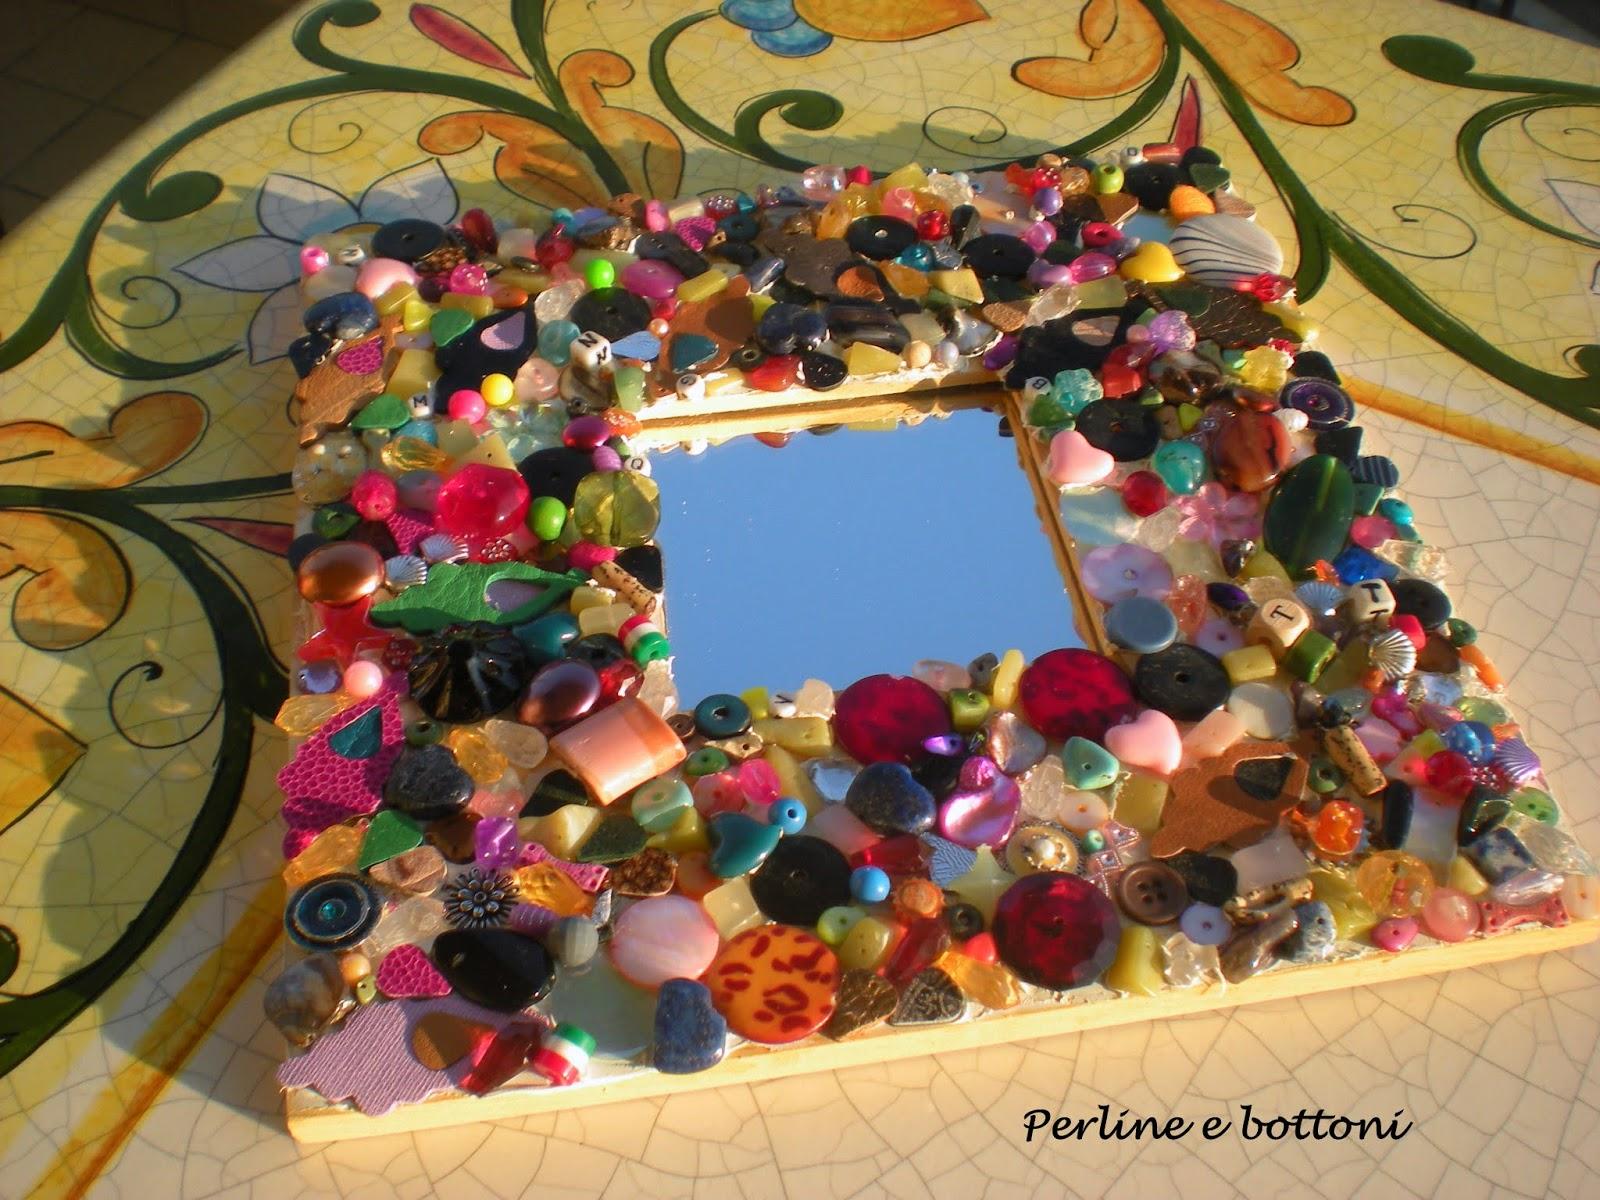 Perline e bottoni ikea colla e caos - Ikea tappeto bottoni ...